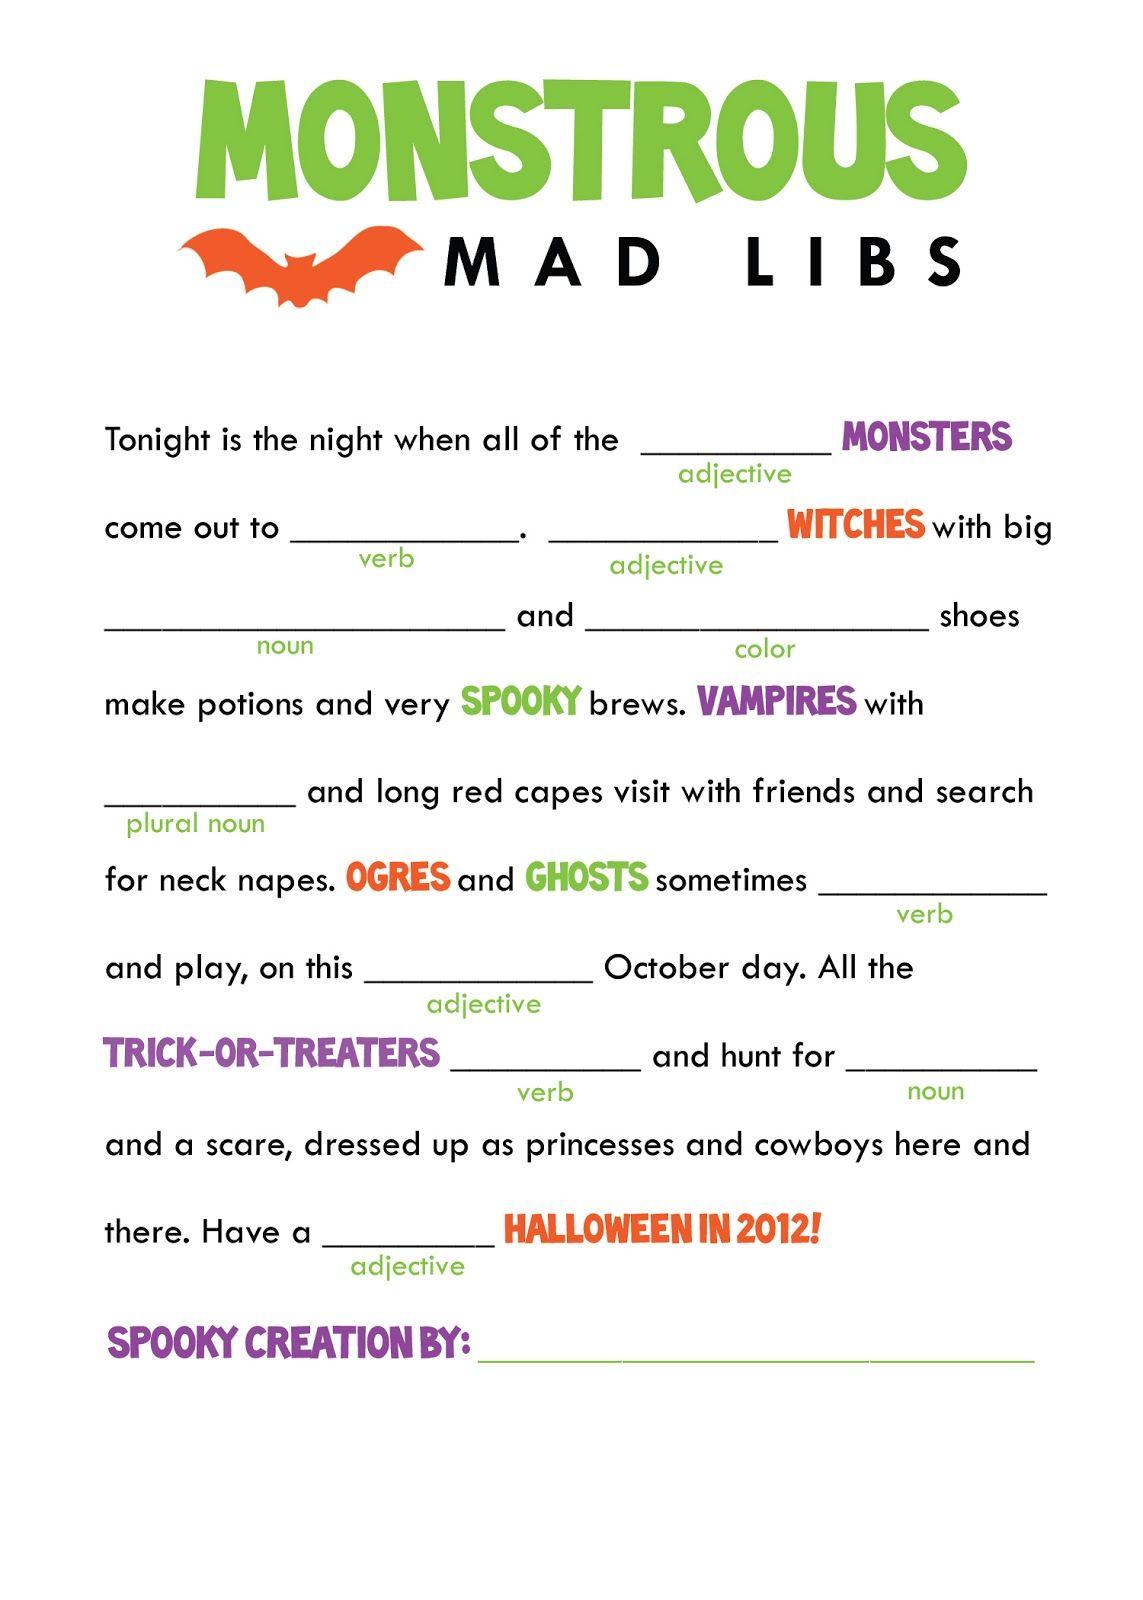 Halloween Mad Libs. | Halloween Class Party, Halloween